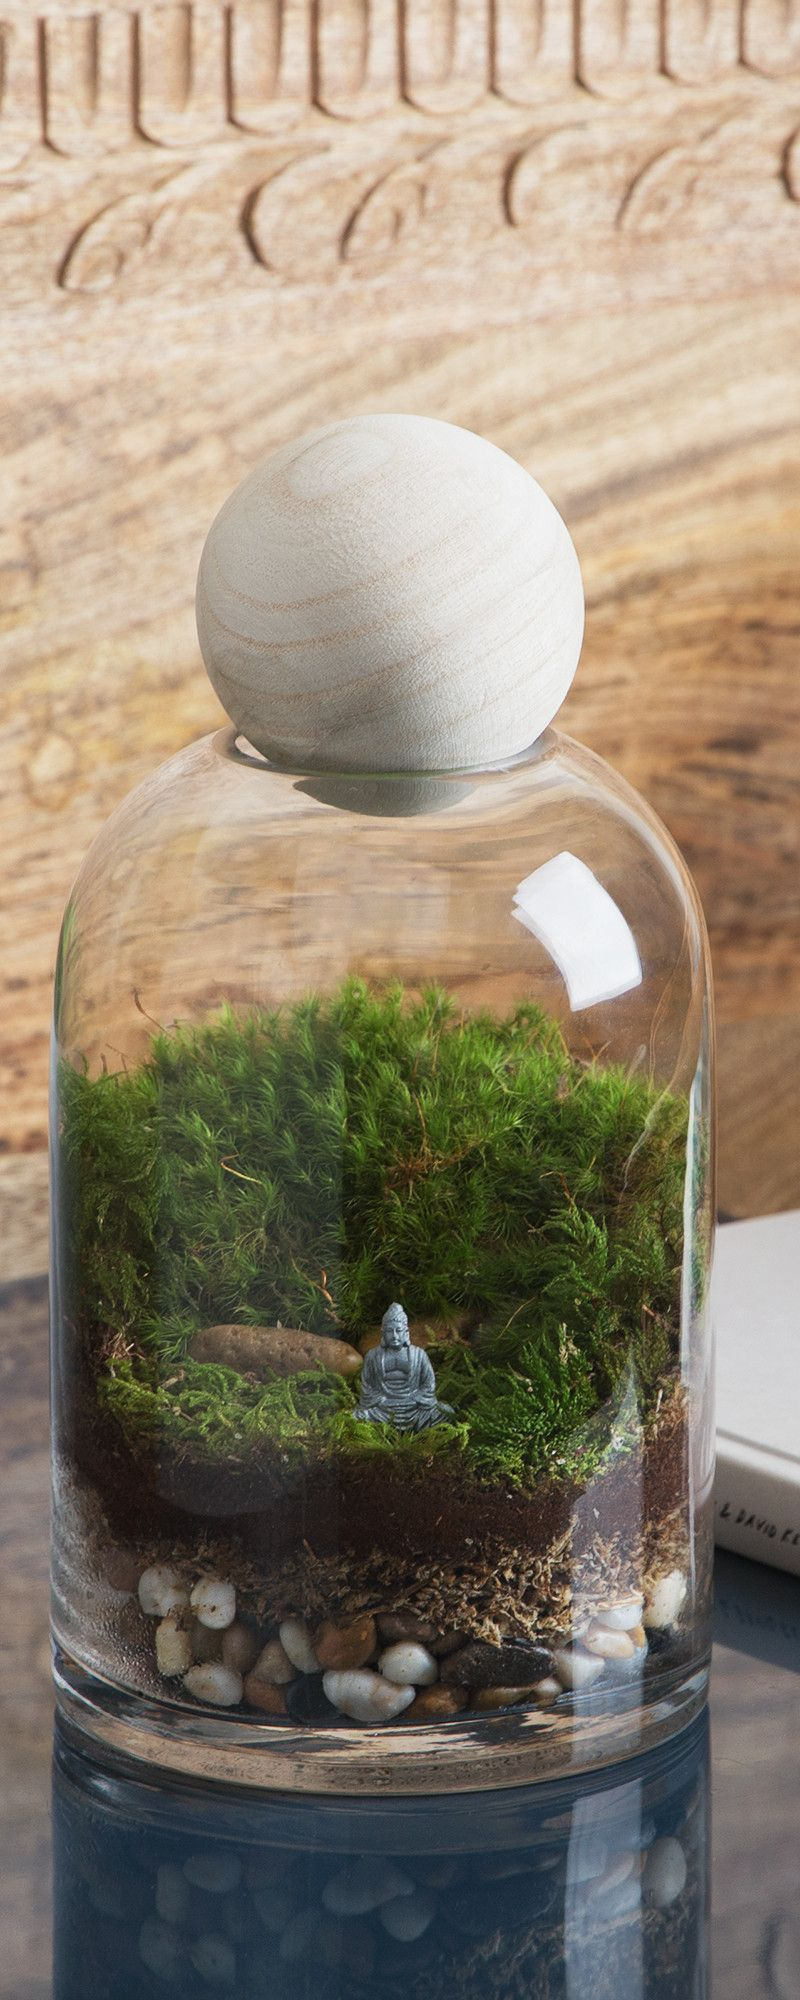 Twig terrariums diy kit for gallon sized container gardeningdiy